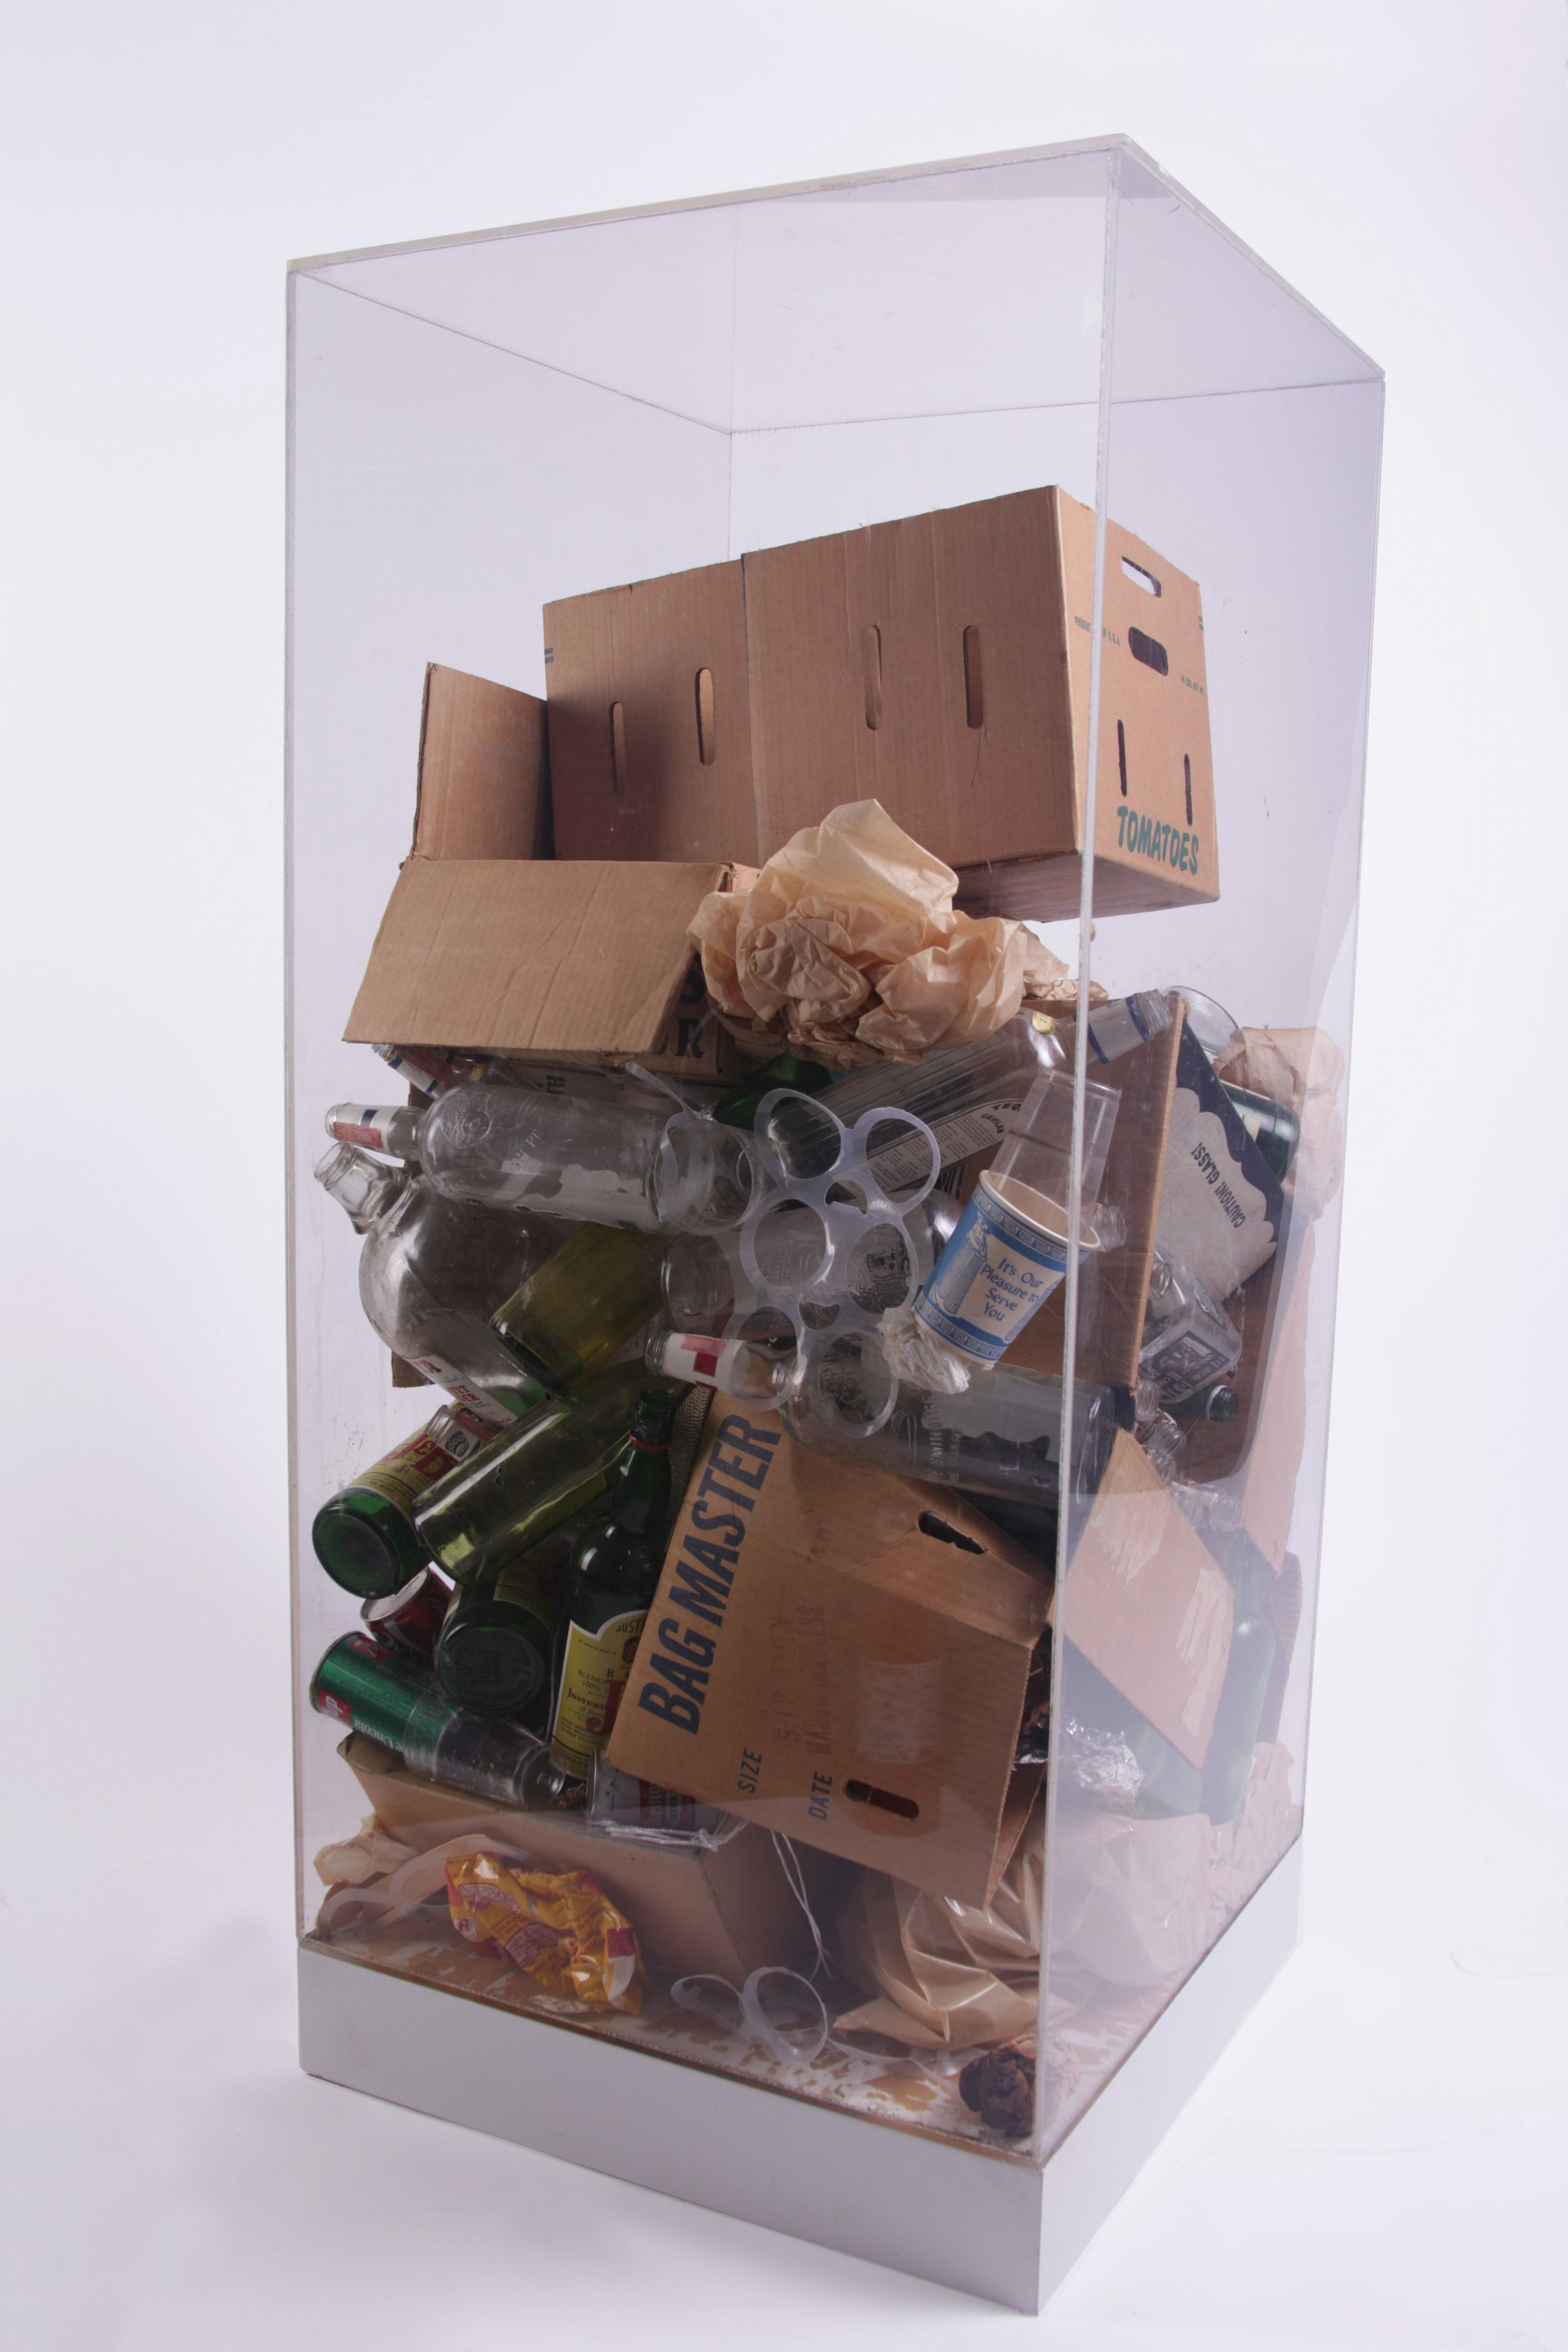 ARMAN,Robert Rauschenberg's Refuse, 1970 Accumulation of studio refuse in Plexiglas box 48 x 24 x 24 in. (122 x 61 x 61 cm), Unique and original